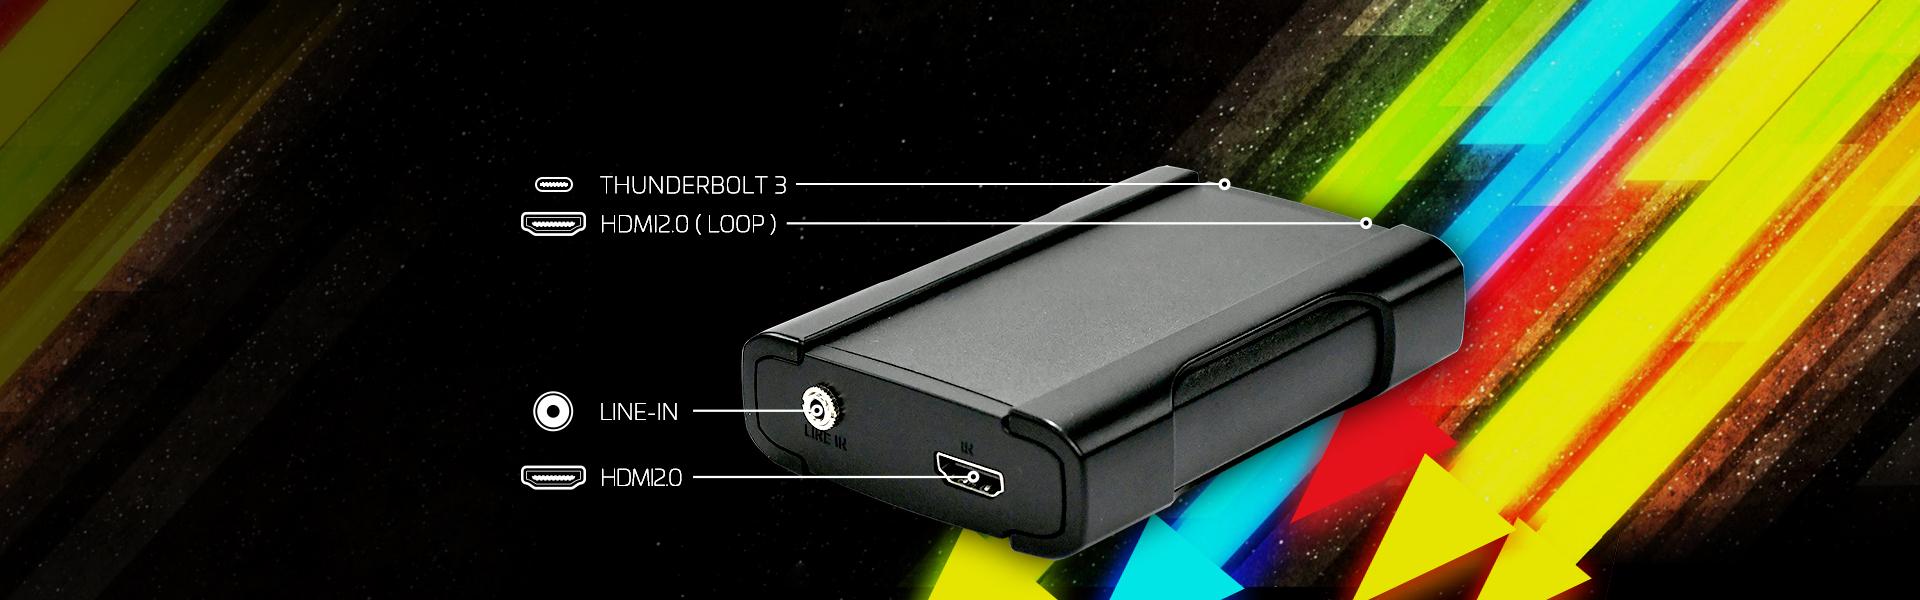 Thunderbolt 4K60 HDR Capture Device